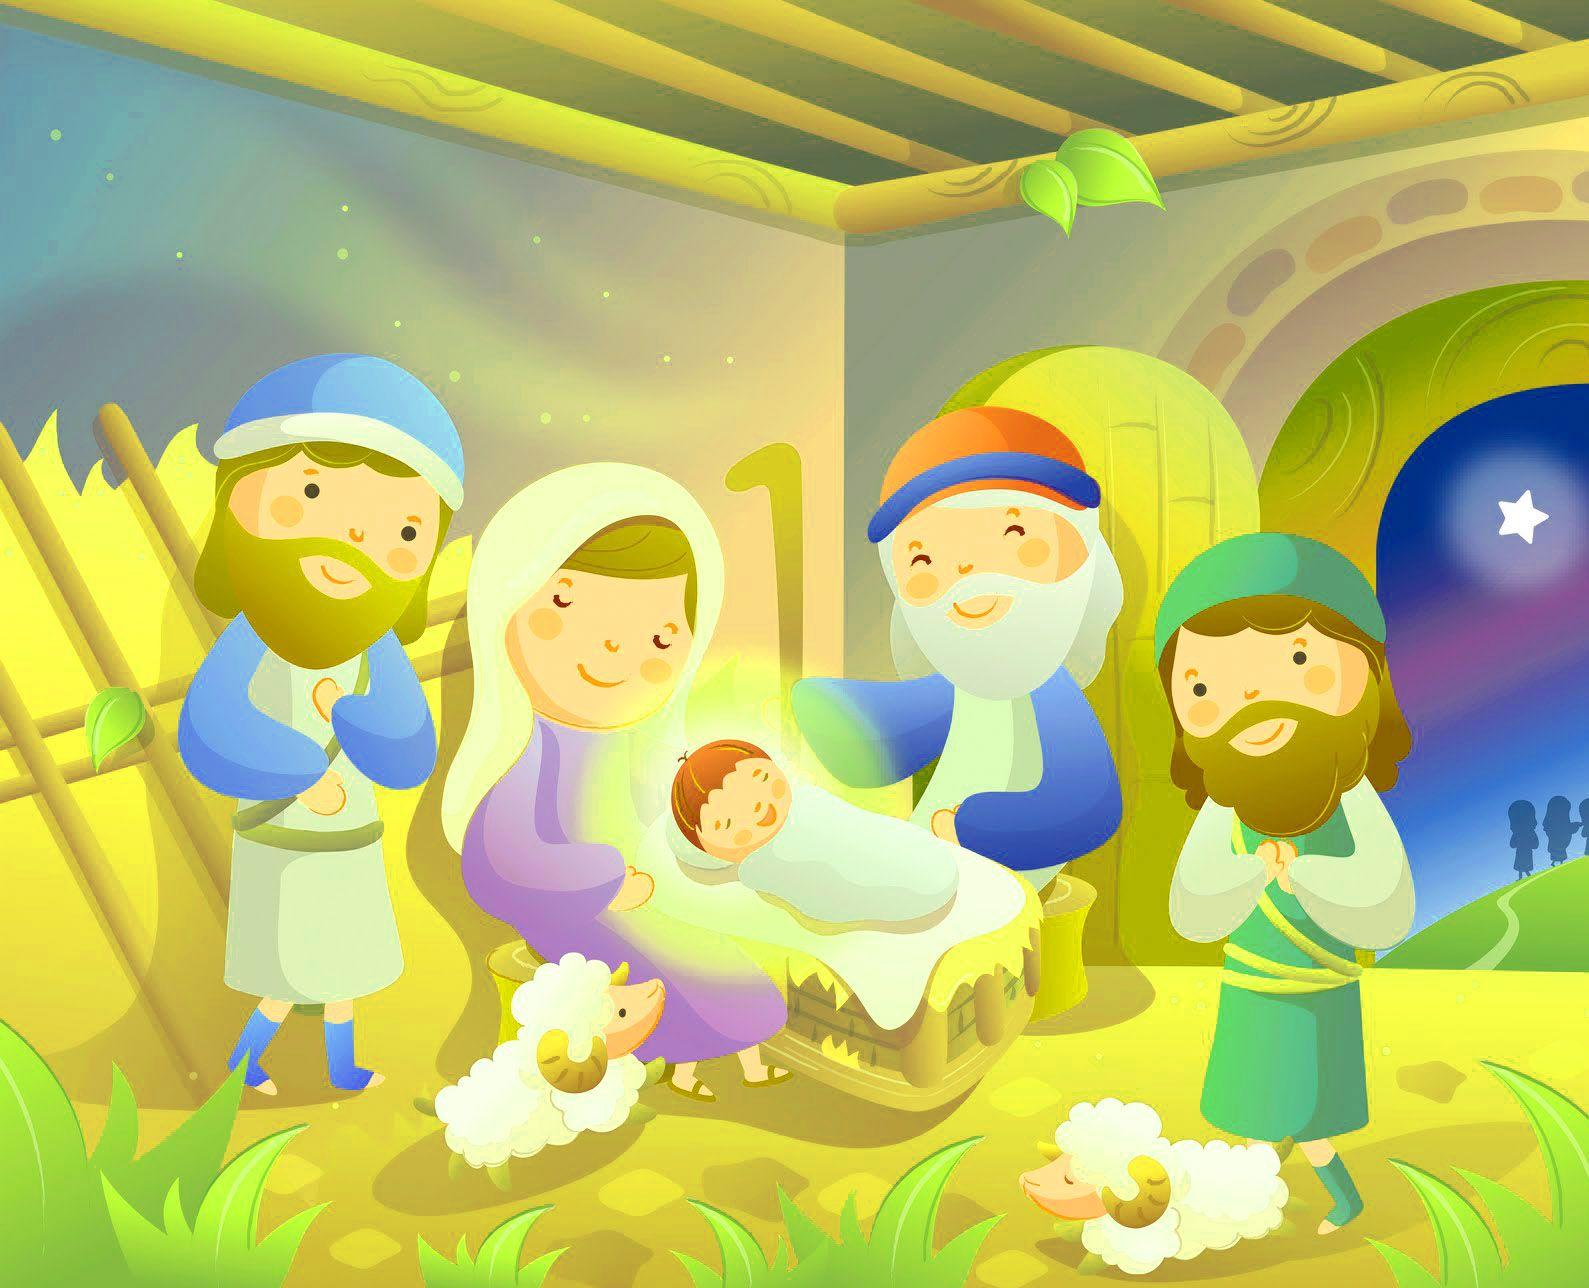 Dibujos Del Nino Jesus Para Imprimir Dibujos De Jesus De Jesus Imagenes De Jesus